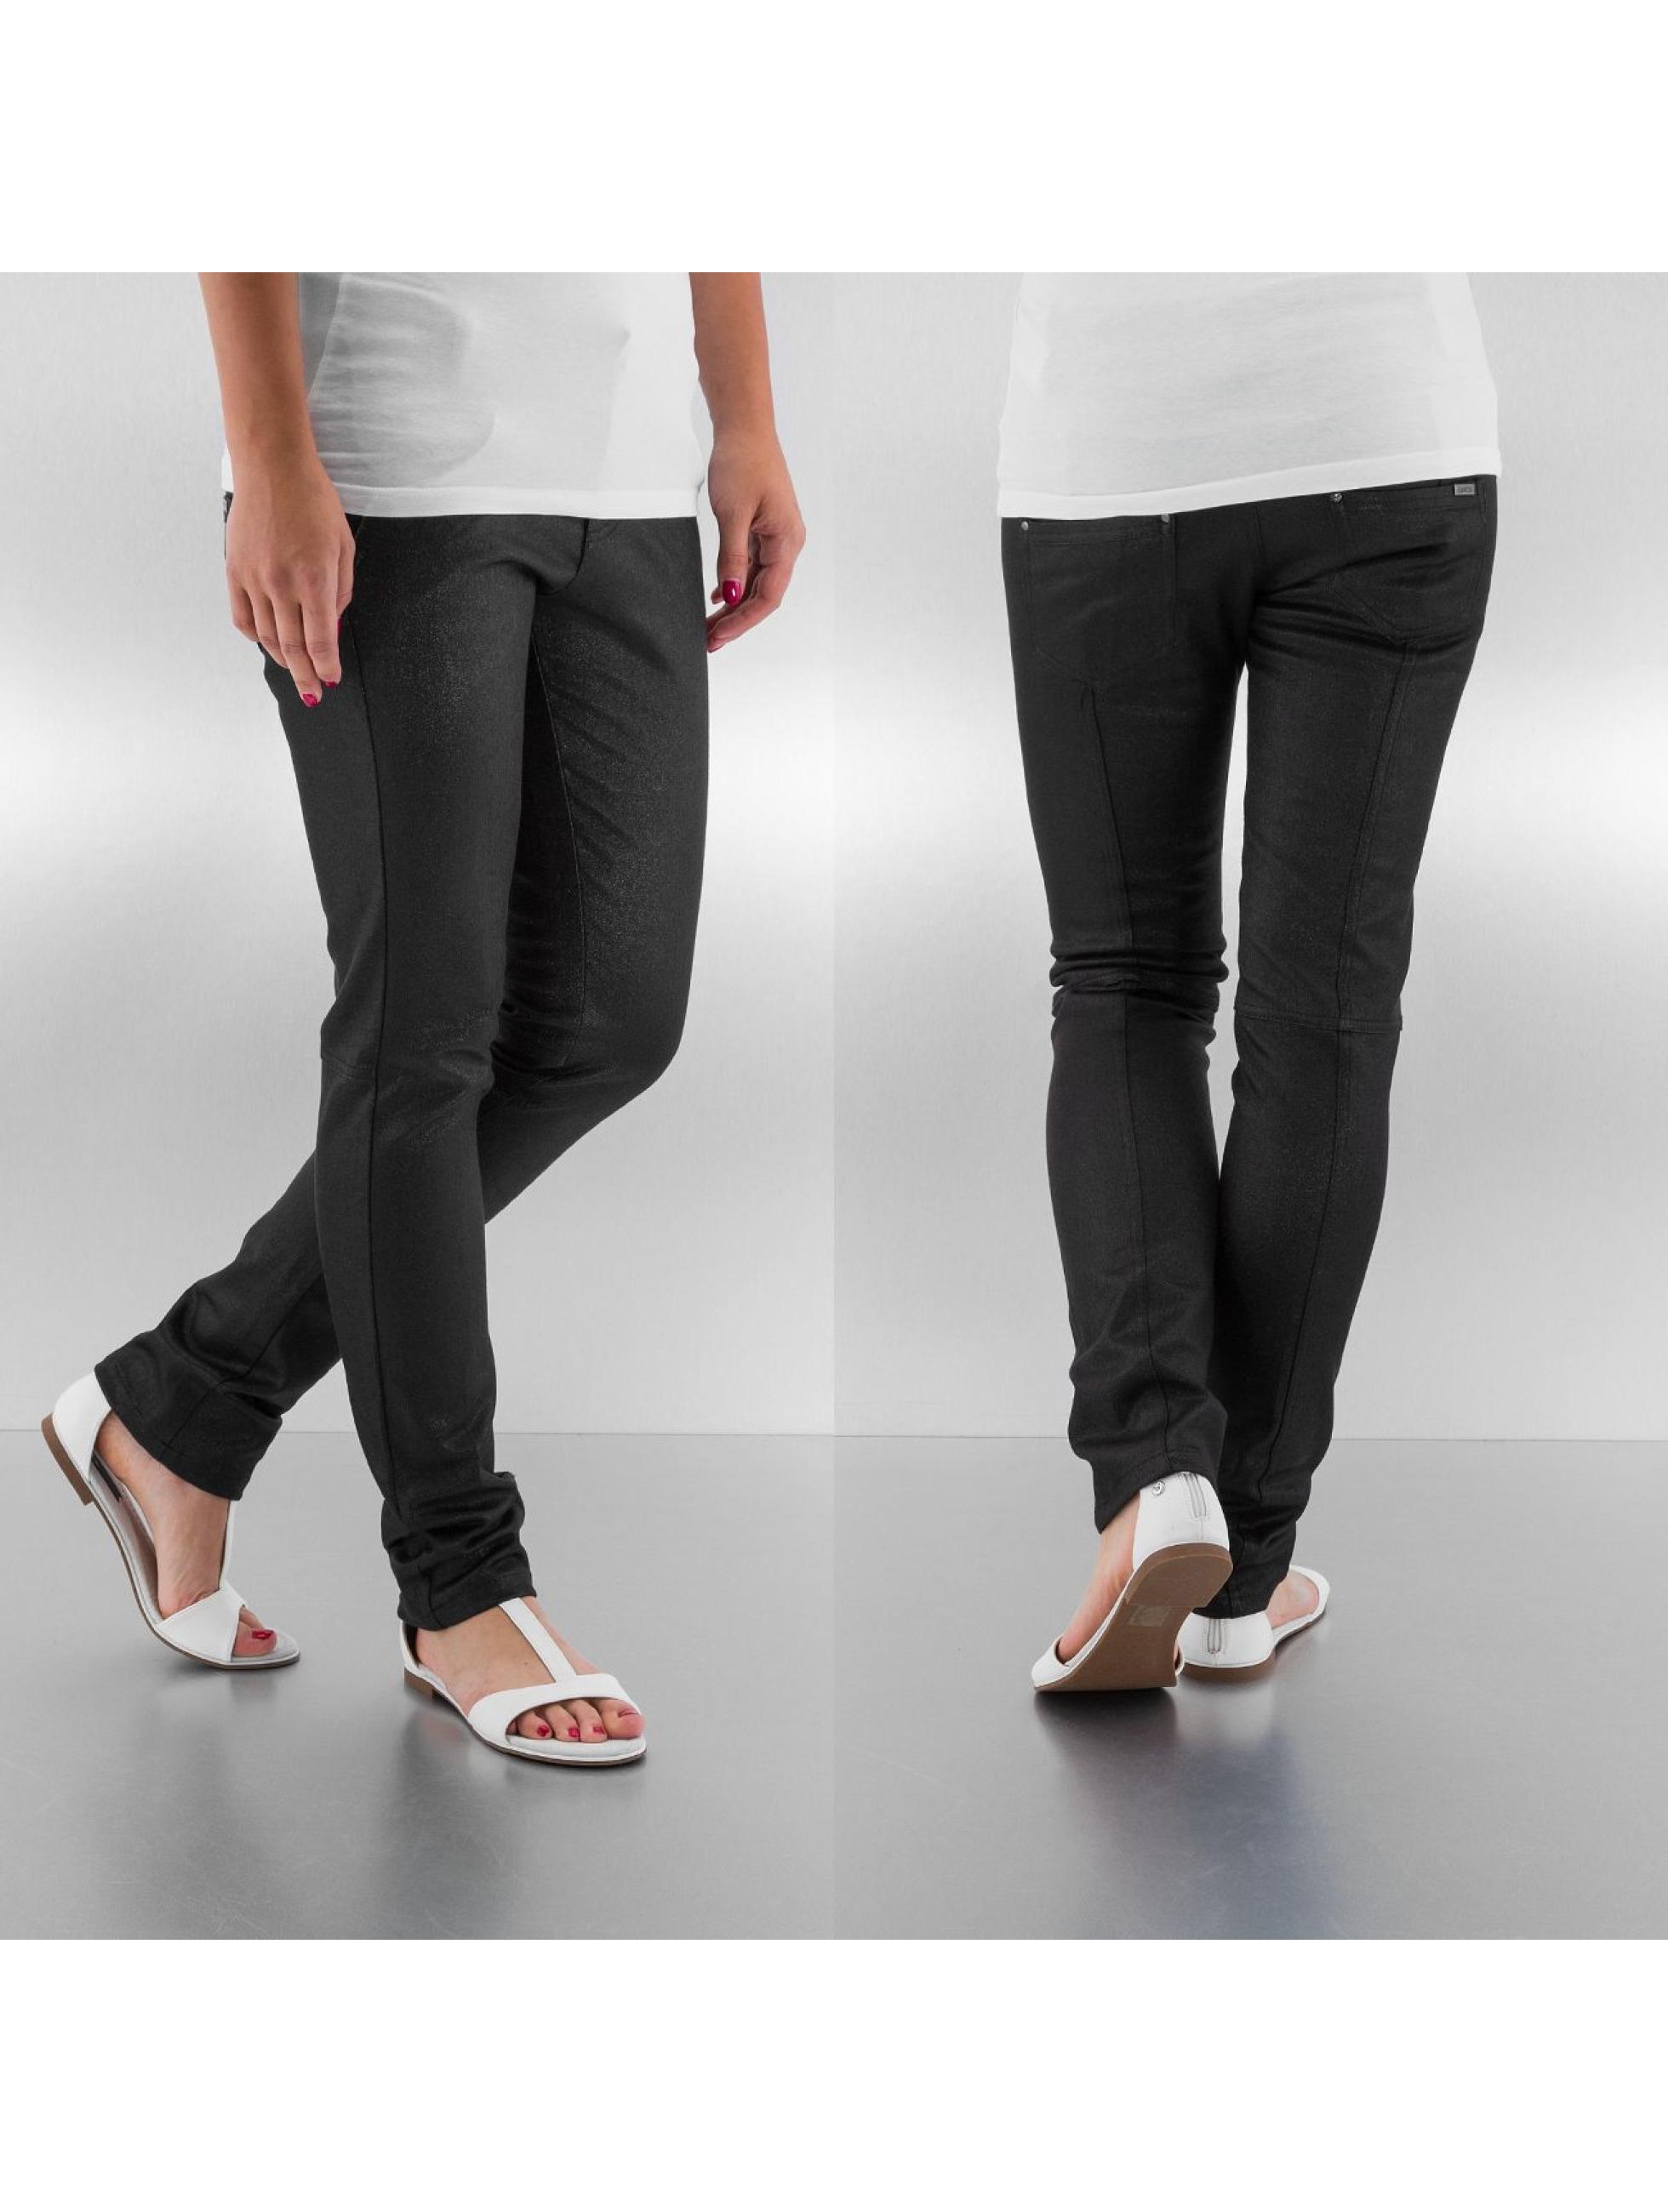 New York Style Jean / Jeans Straight Fit Lantin Glamour en noir